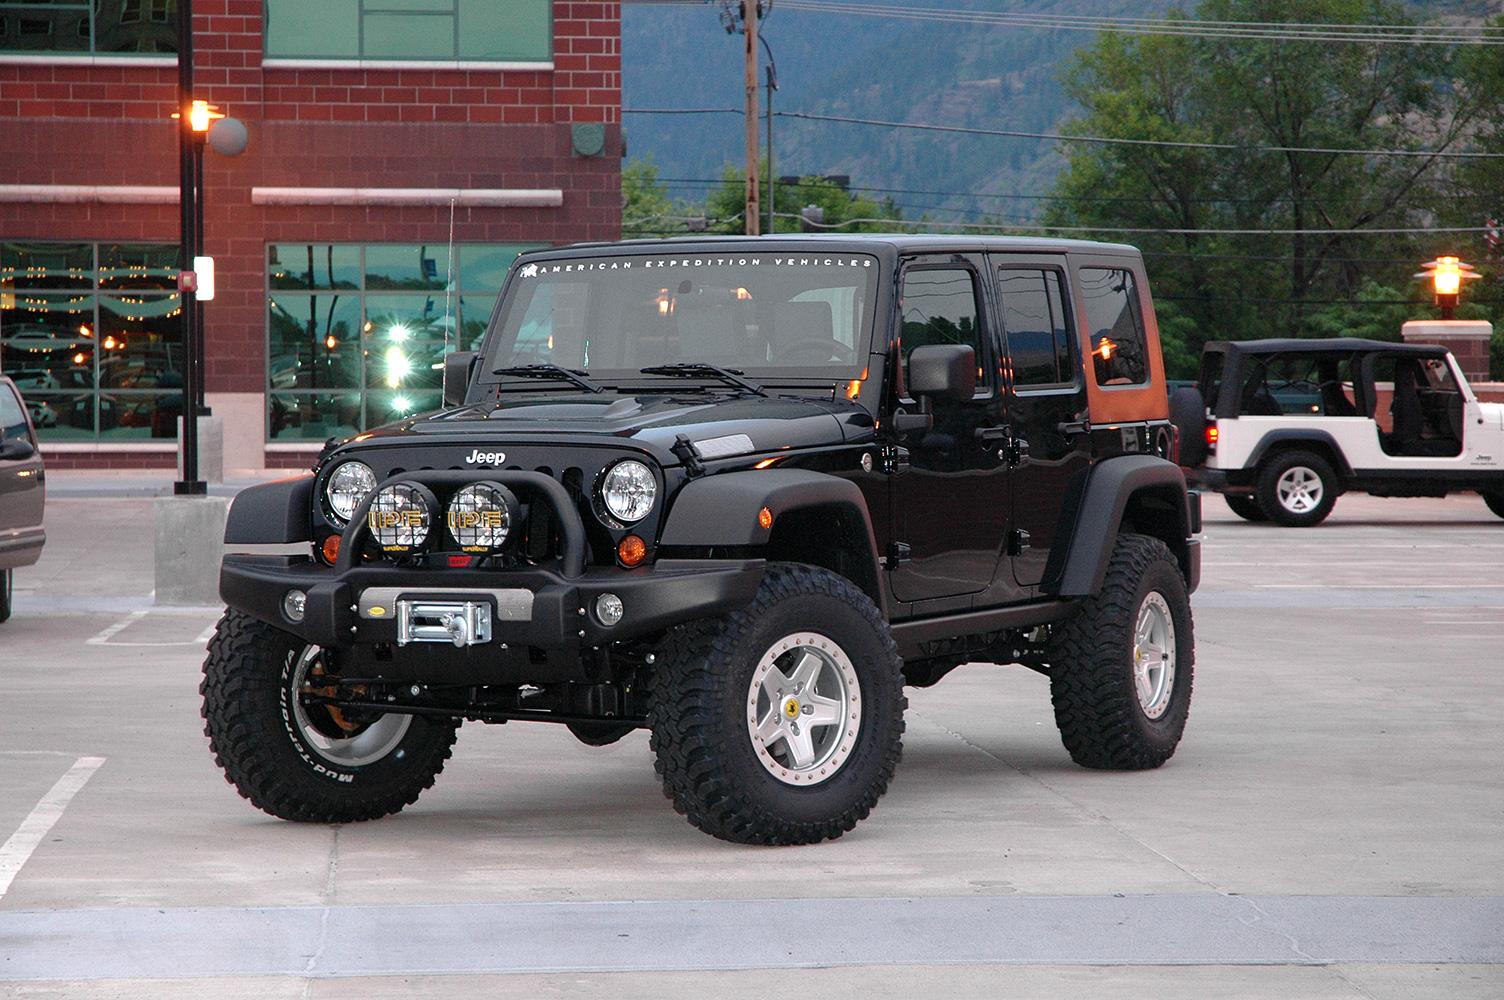 Jeep Wrangler Hemi >> AEV Installs 6.4L HEMI on Jeep JK Wrangler; Vehicle to ...